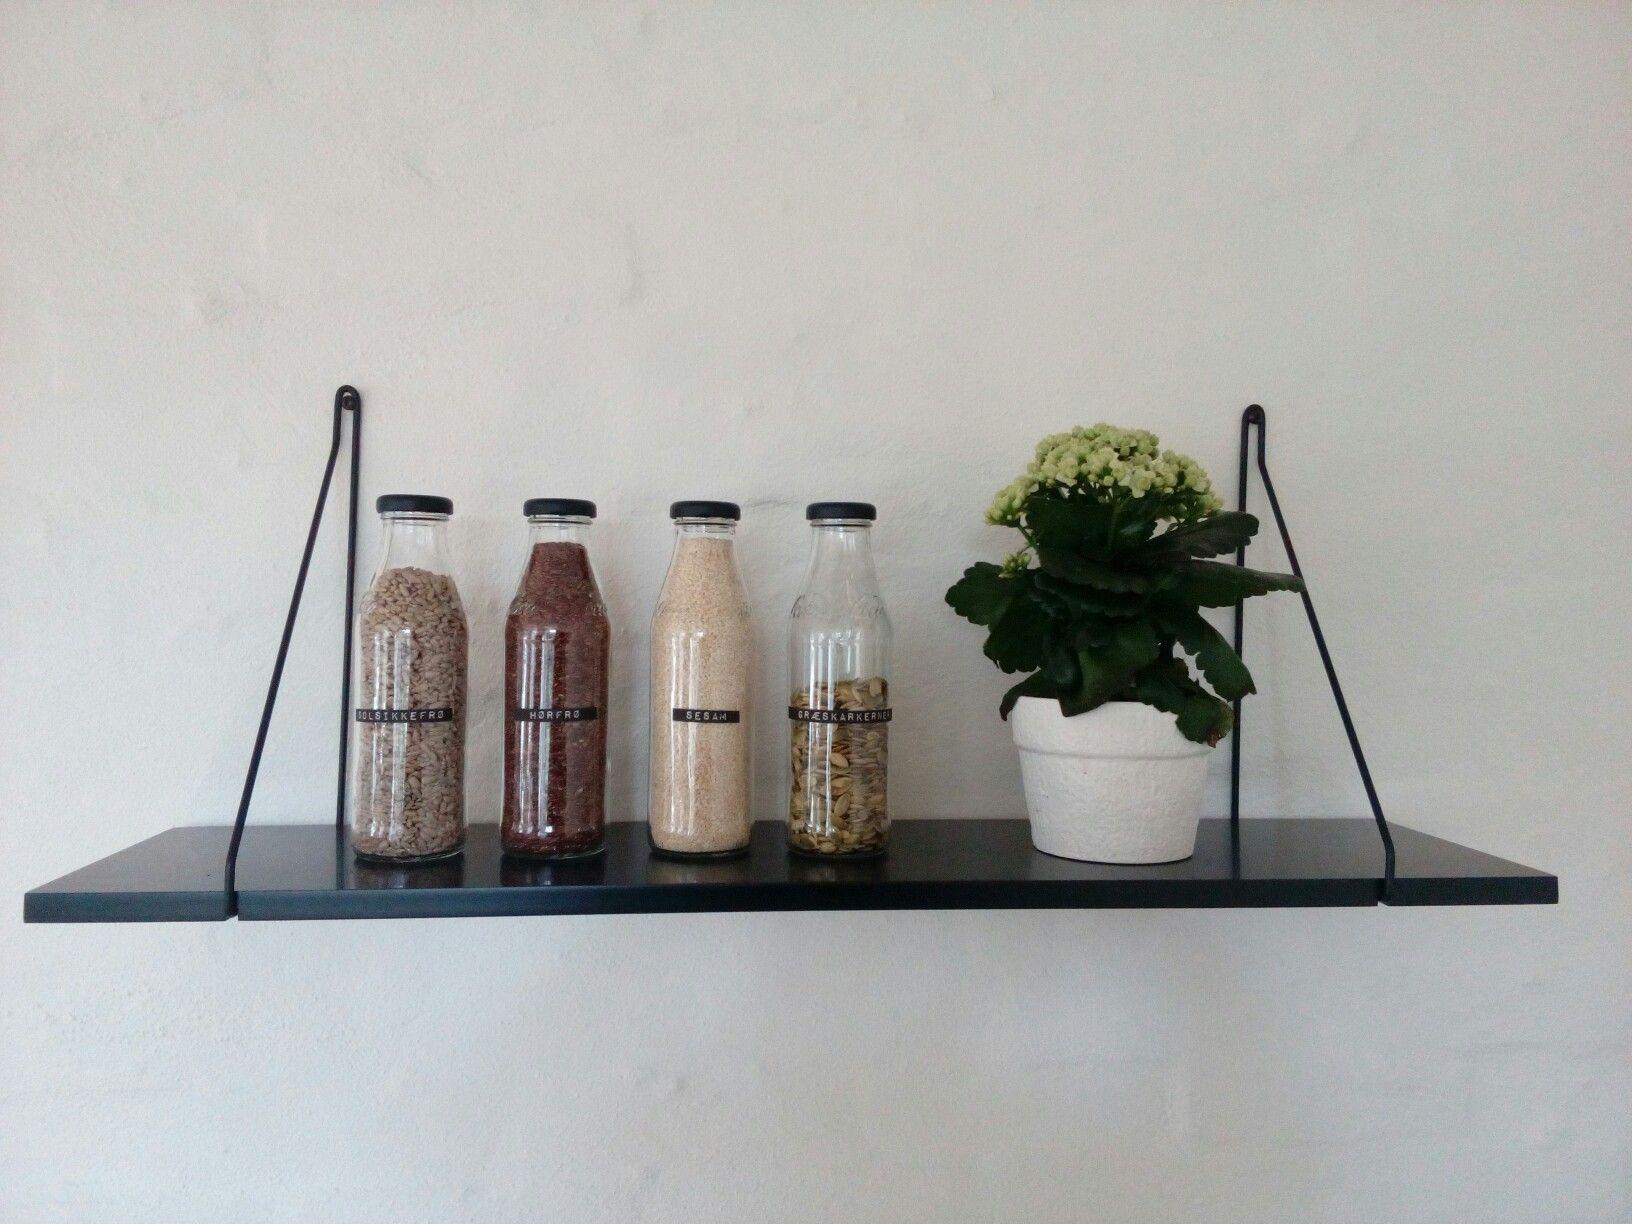 Cocio flasker får nyt liv